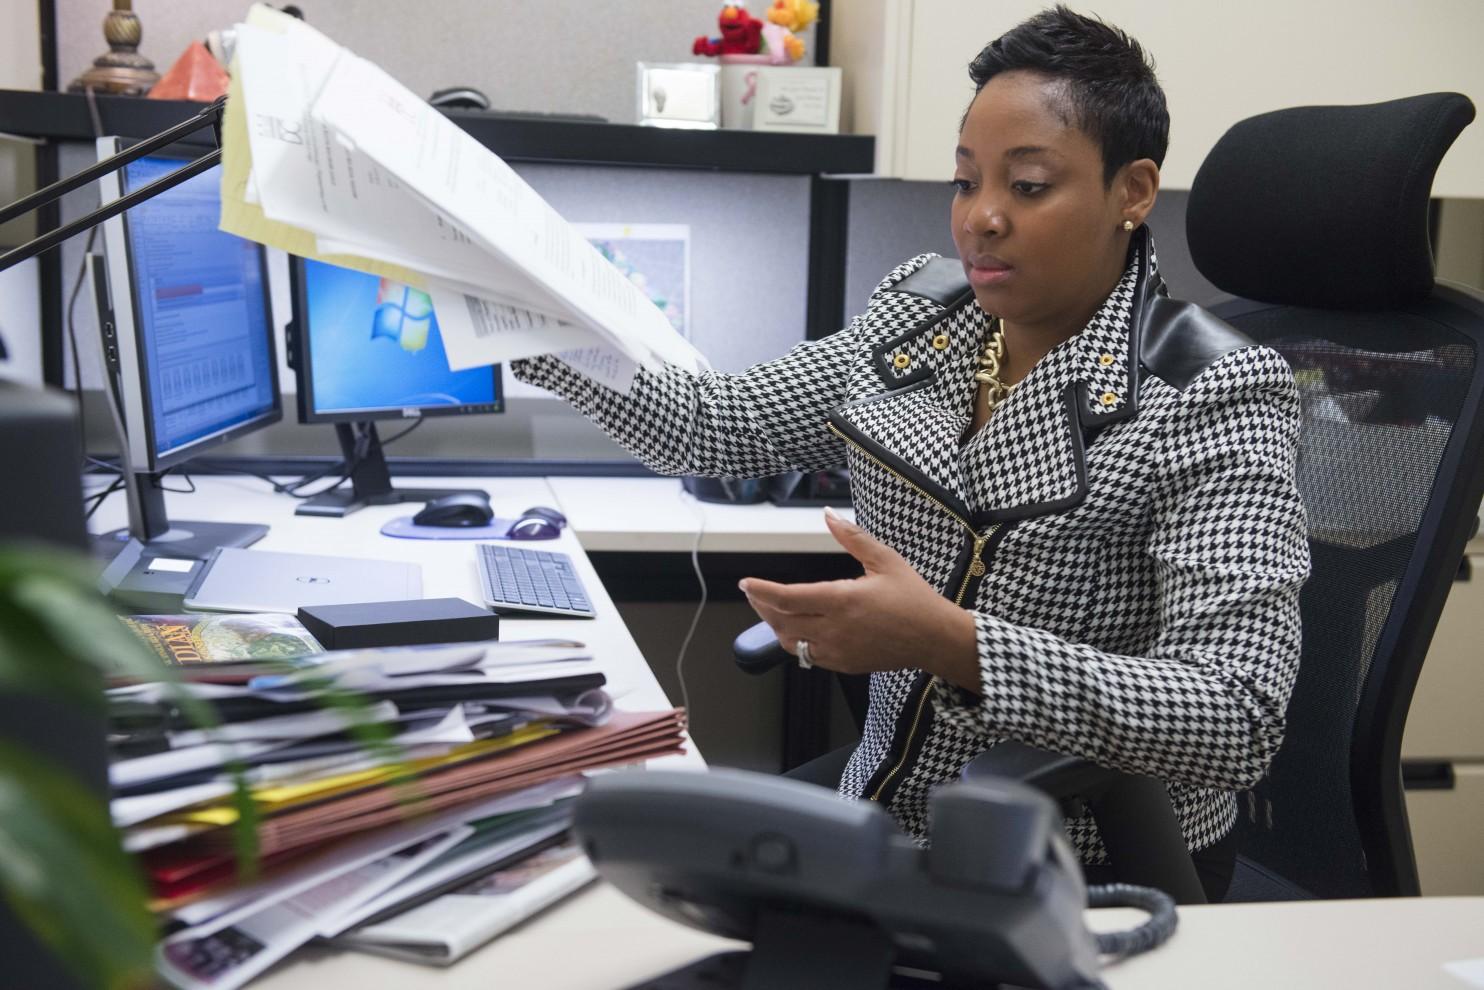 Meet LaDavia Drane, Clinton's Director of African-American Outreach